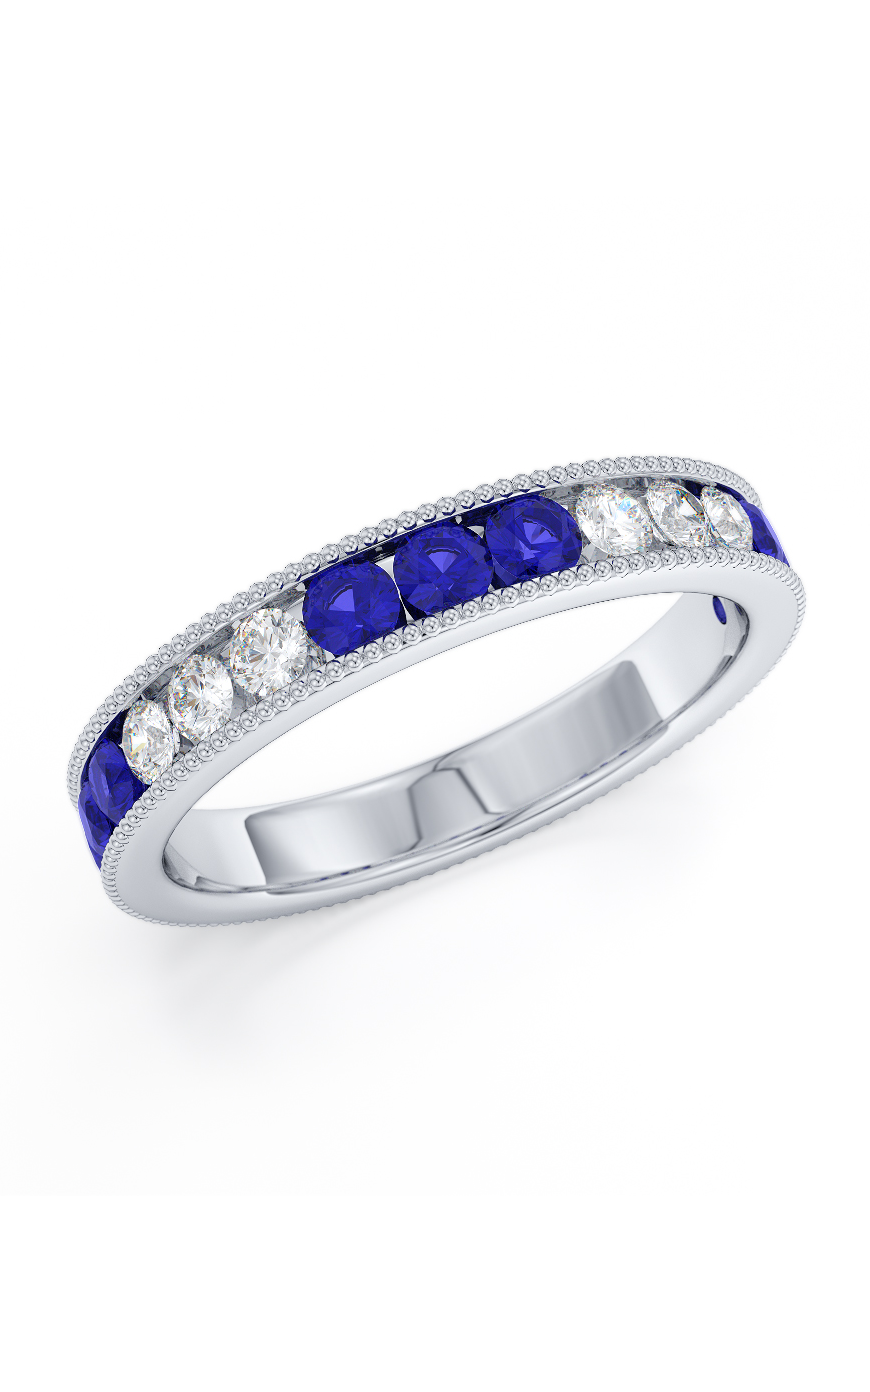 Vibhor Wedding Bands R0490 product image